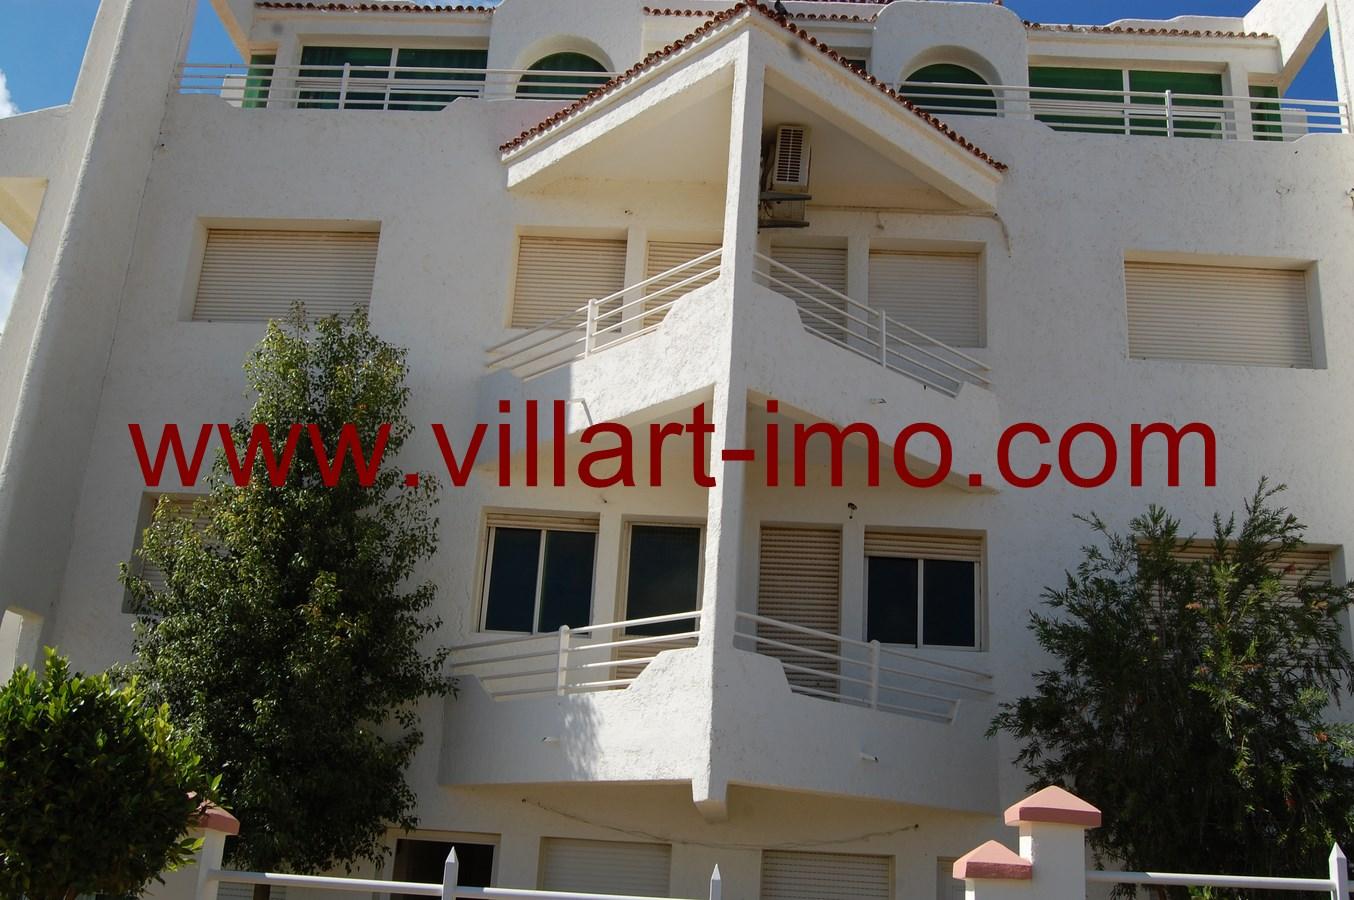 1-Vente-Appartement-Assilah-Autres-Façade-VA62-Villart Immo